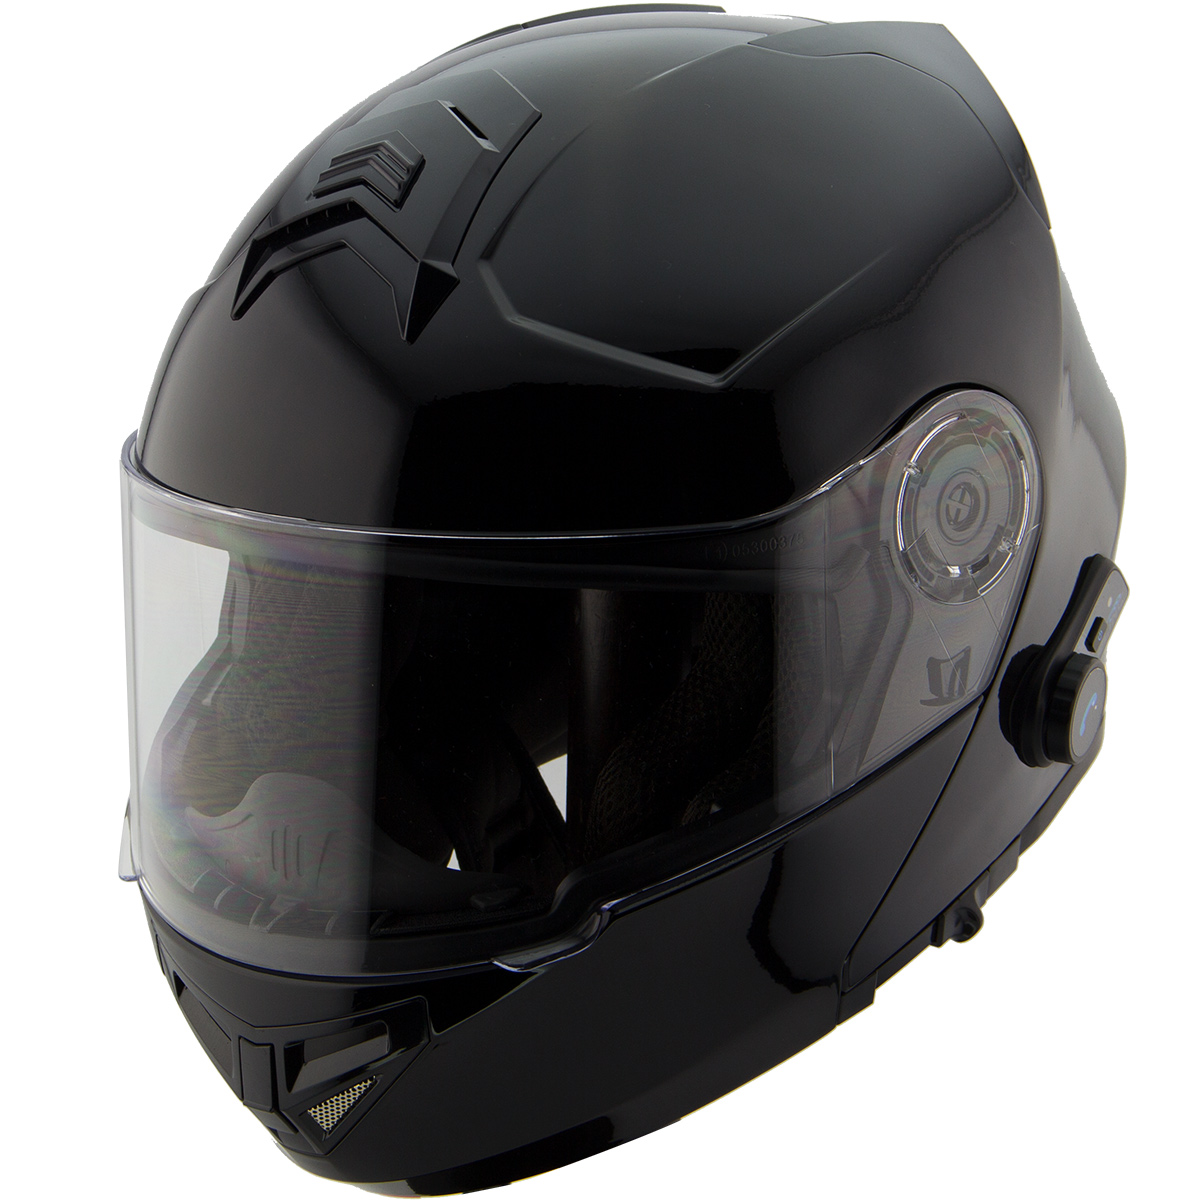 Hawk H7000 Glossy Black Modular Motorcycle Helmet with Blinc Bluetooth